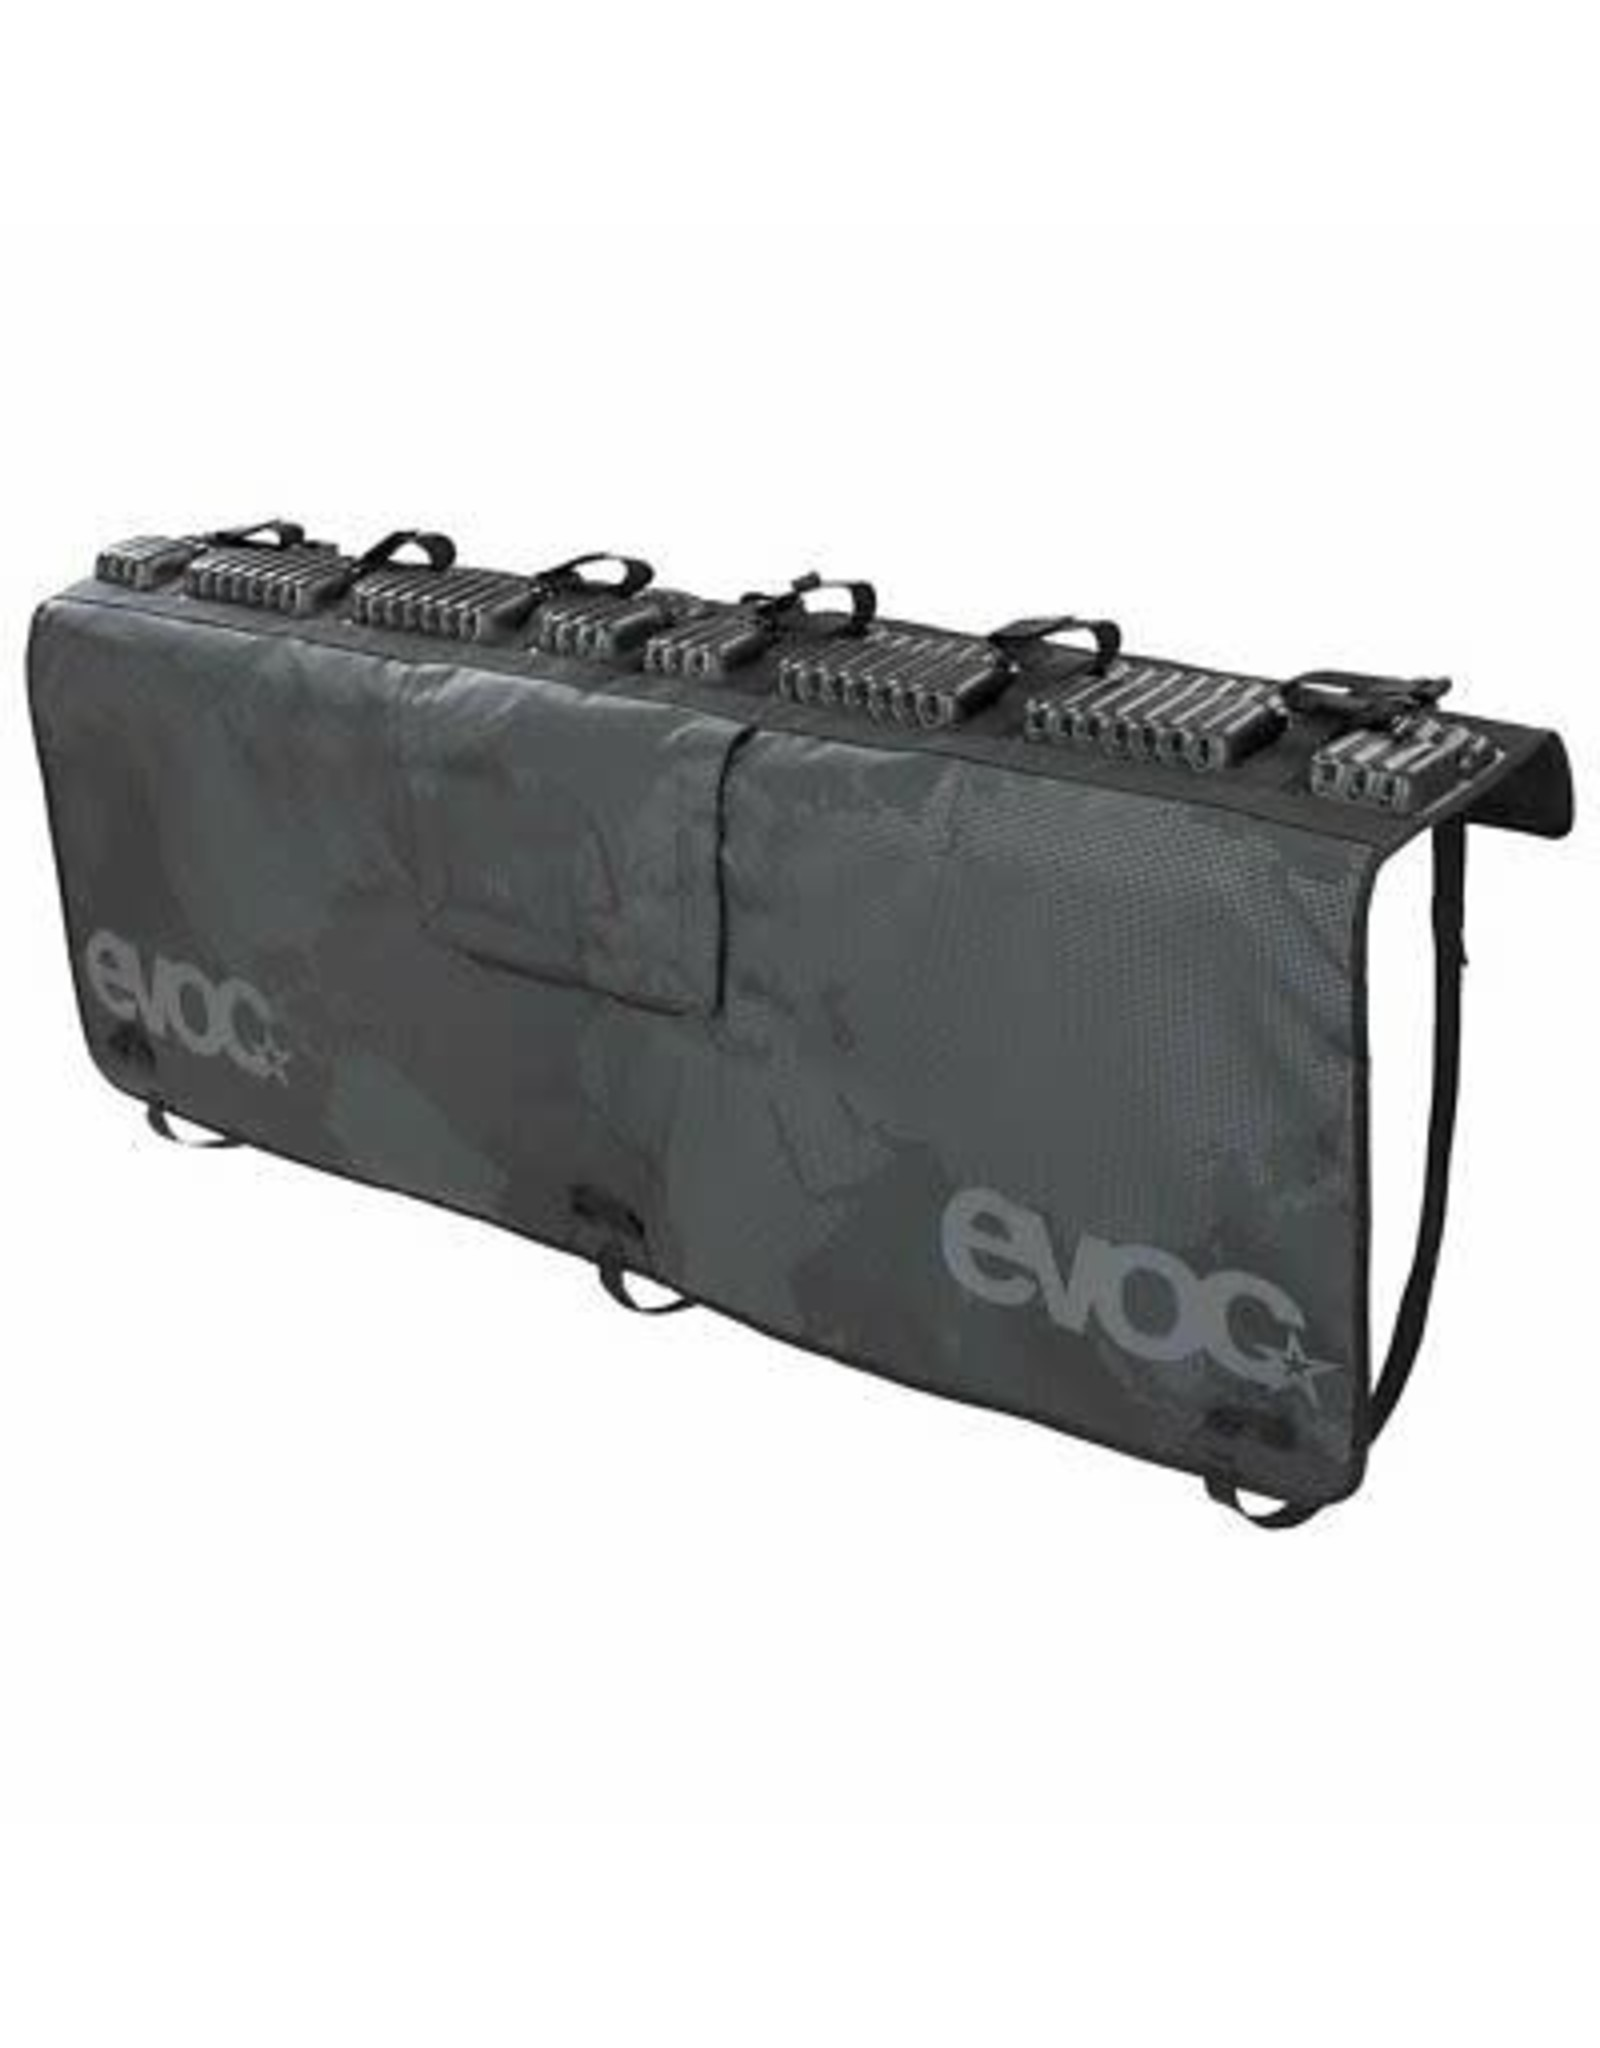 EVOC EVOC - Tailgate Pad for mid-sized trucks, Black